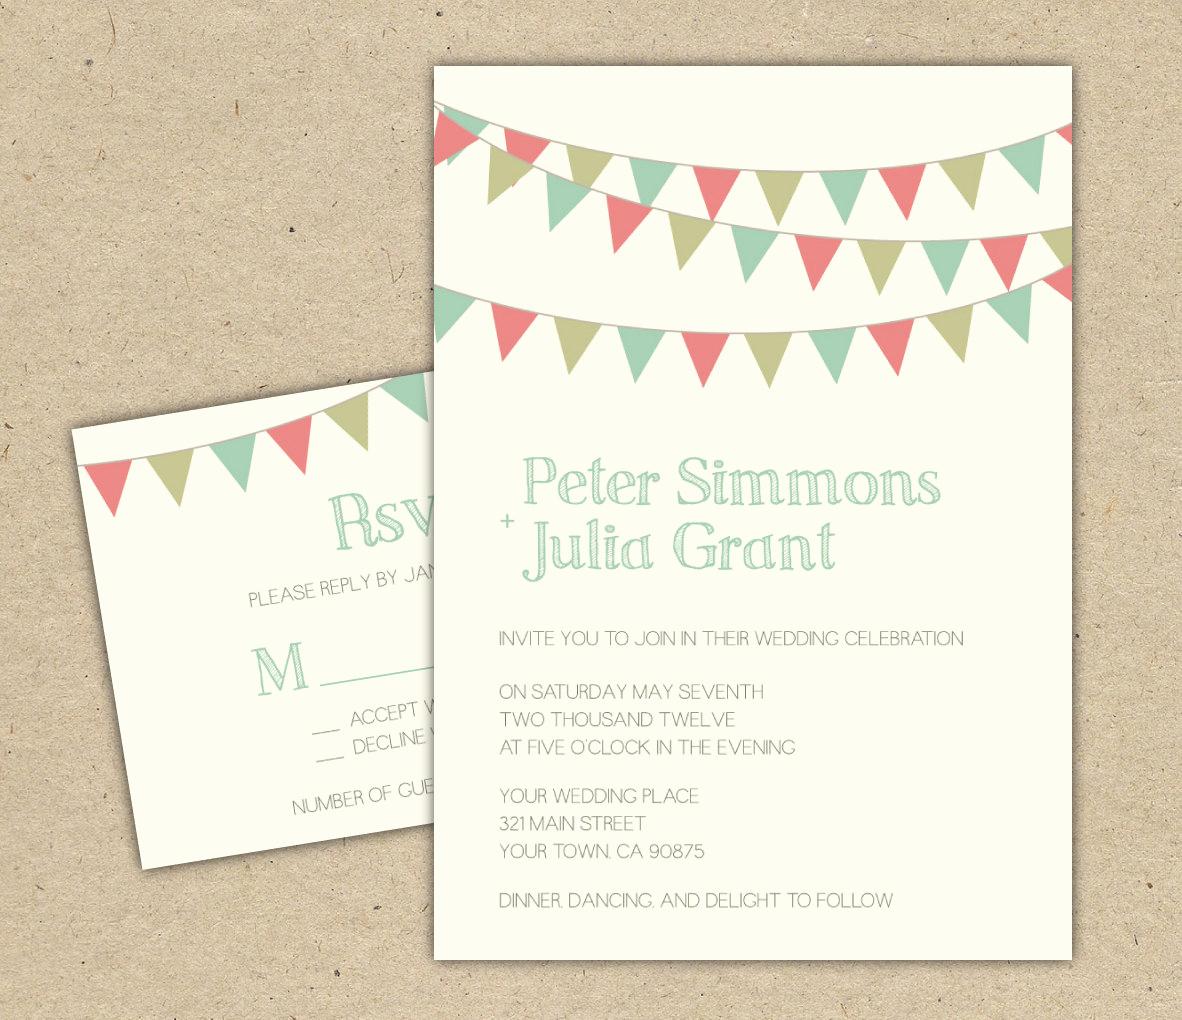 Diy Wedding Invitation Templates Unique Items Similar to Wedding Invitation Diy Printable